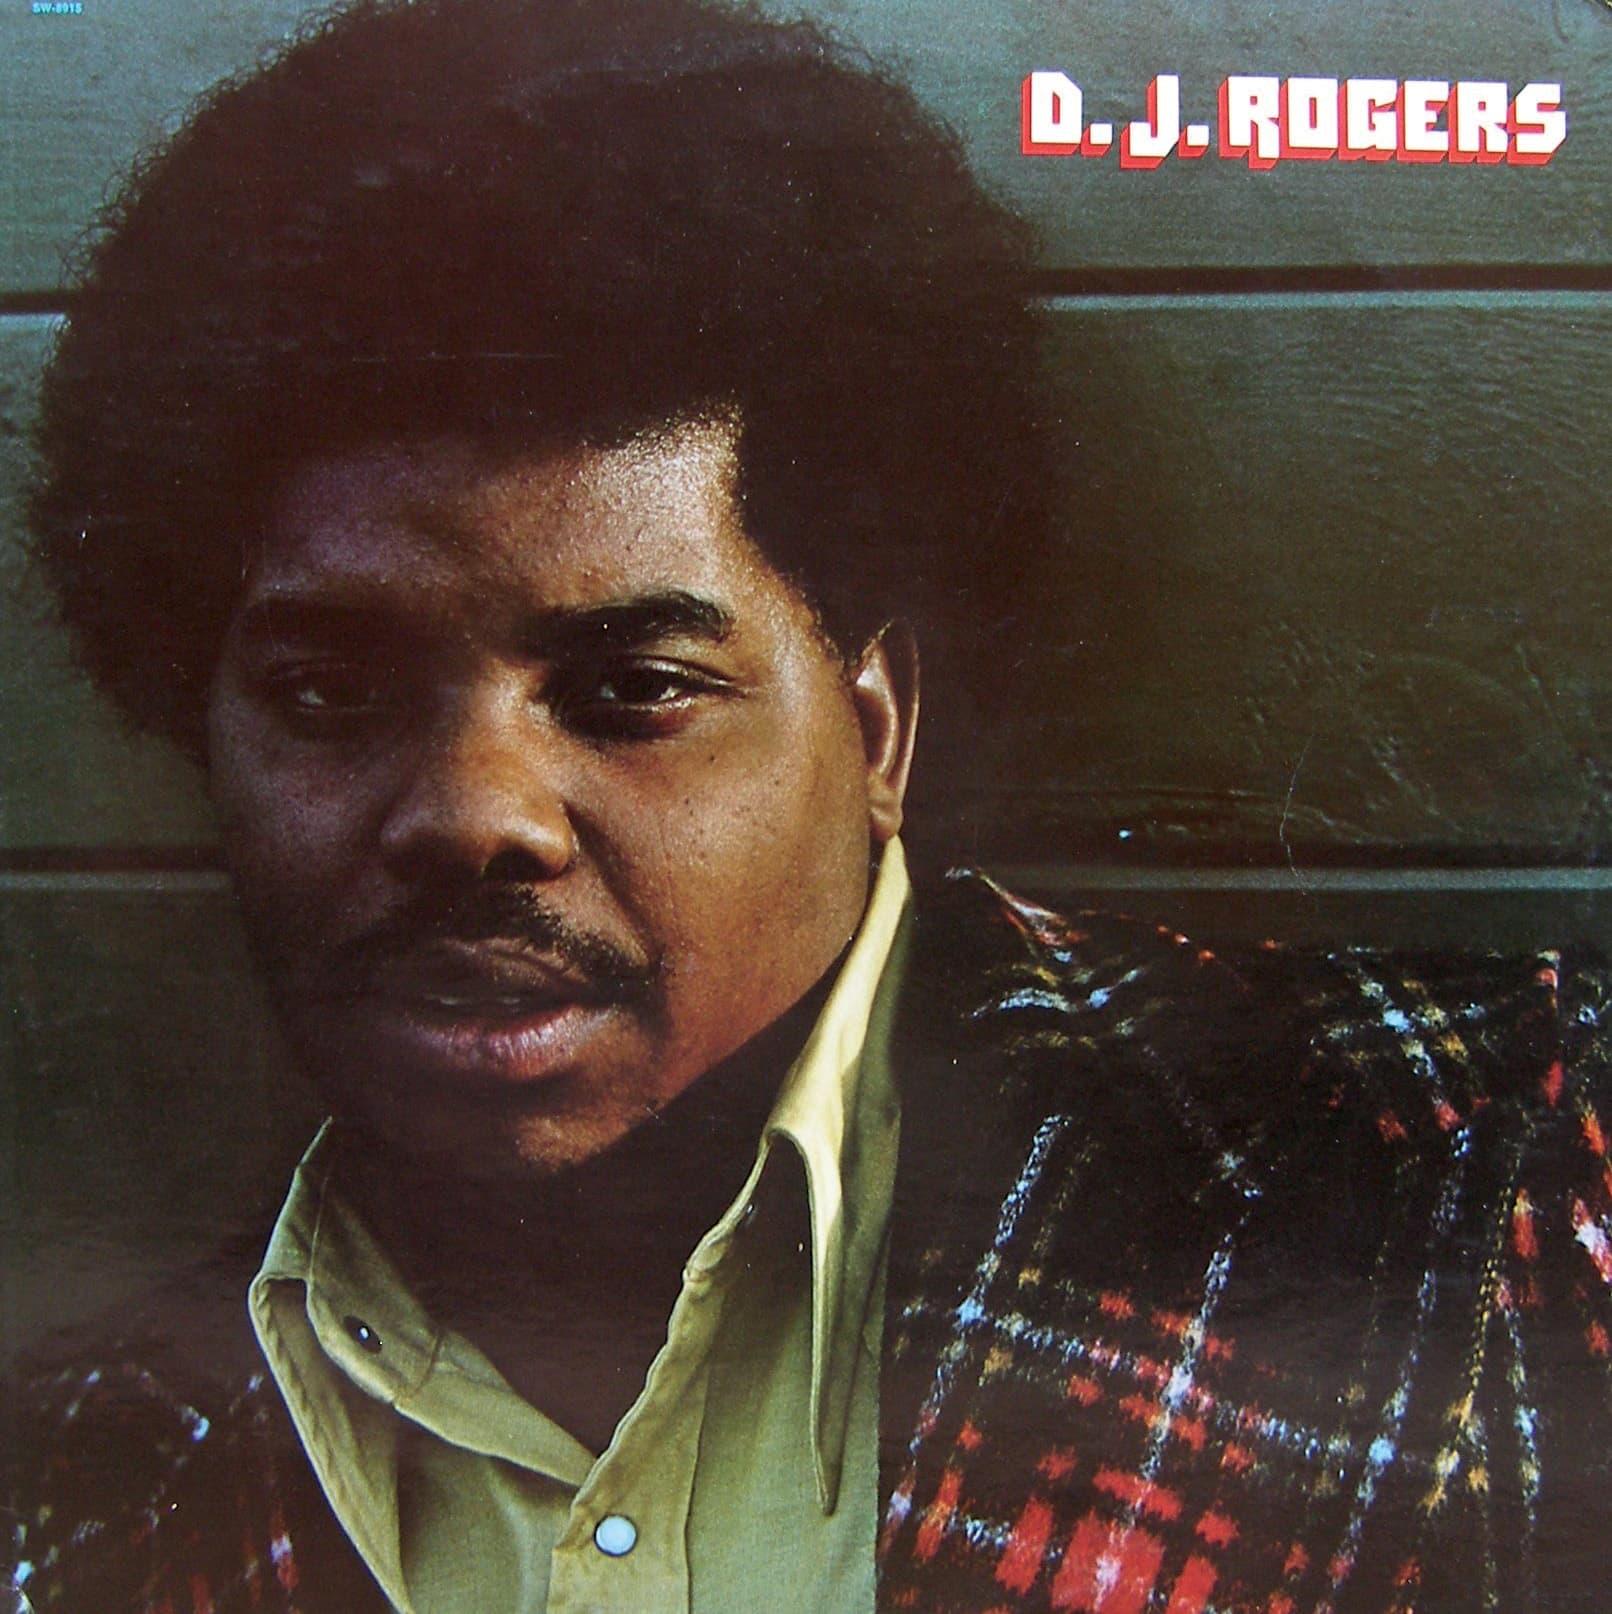 D.J. Rogers - D.J. Rogers